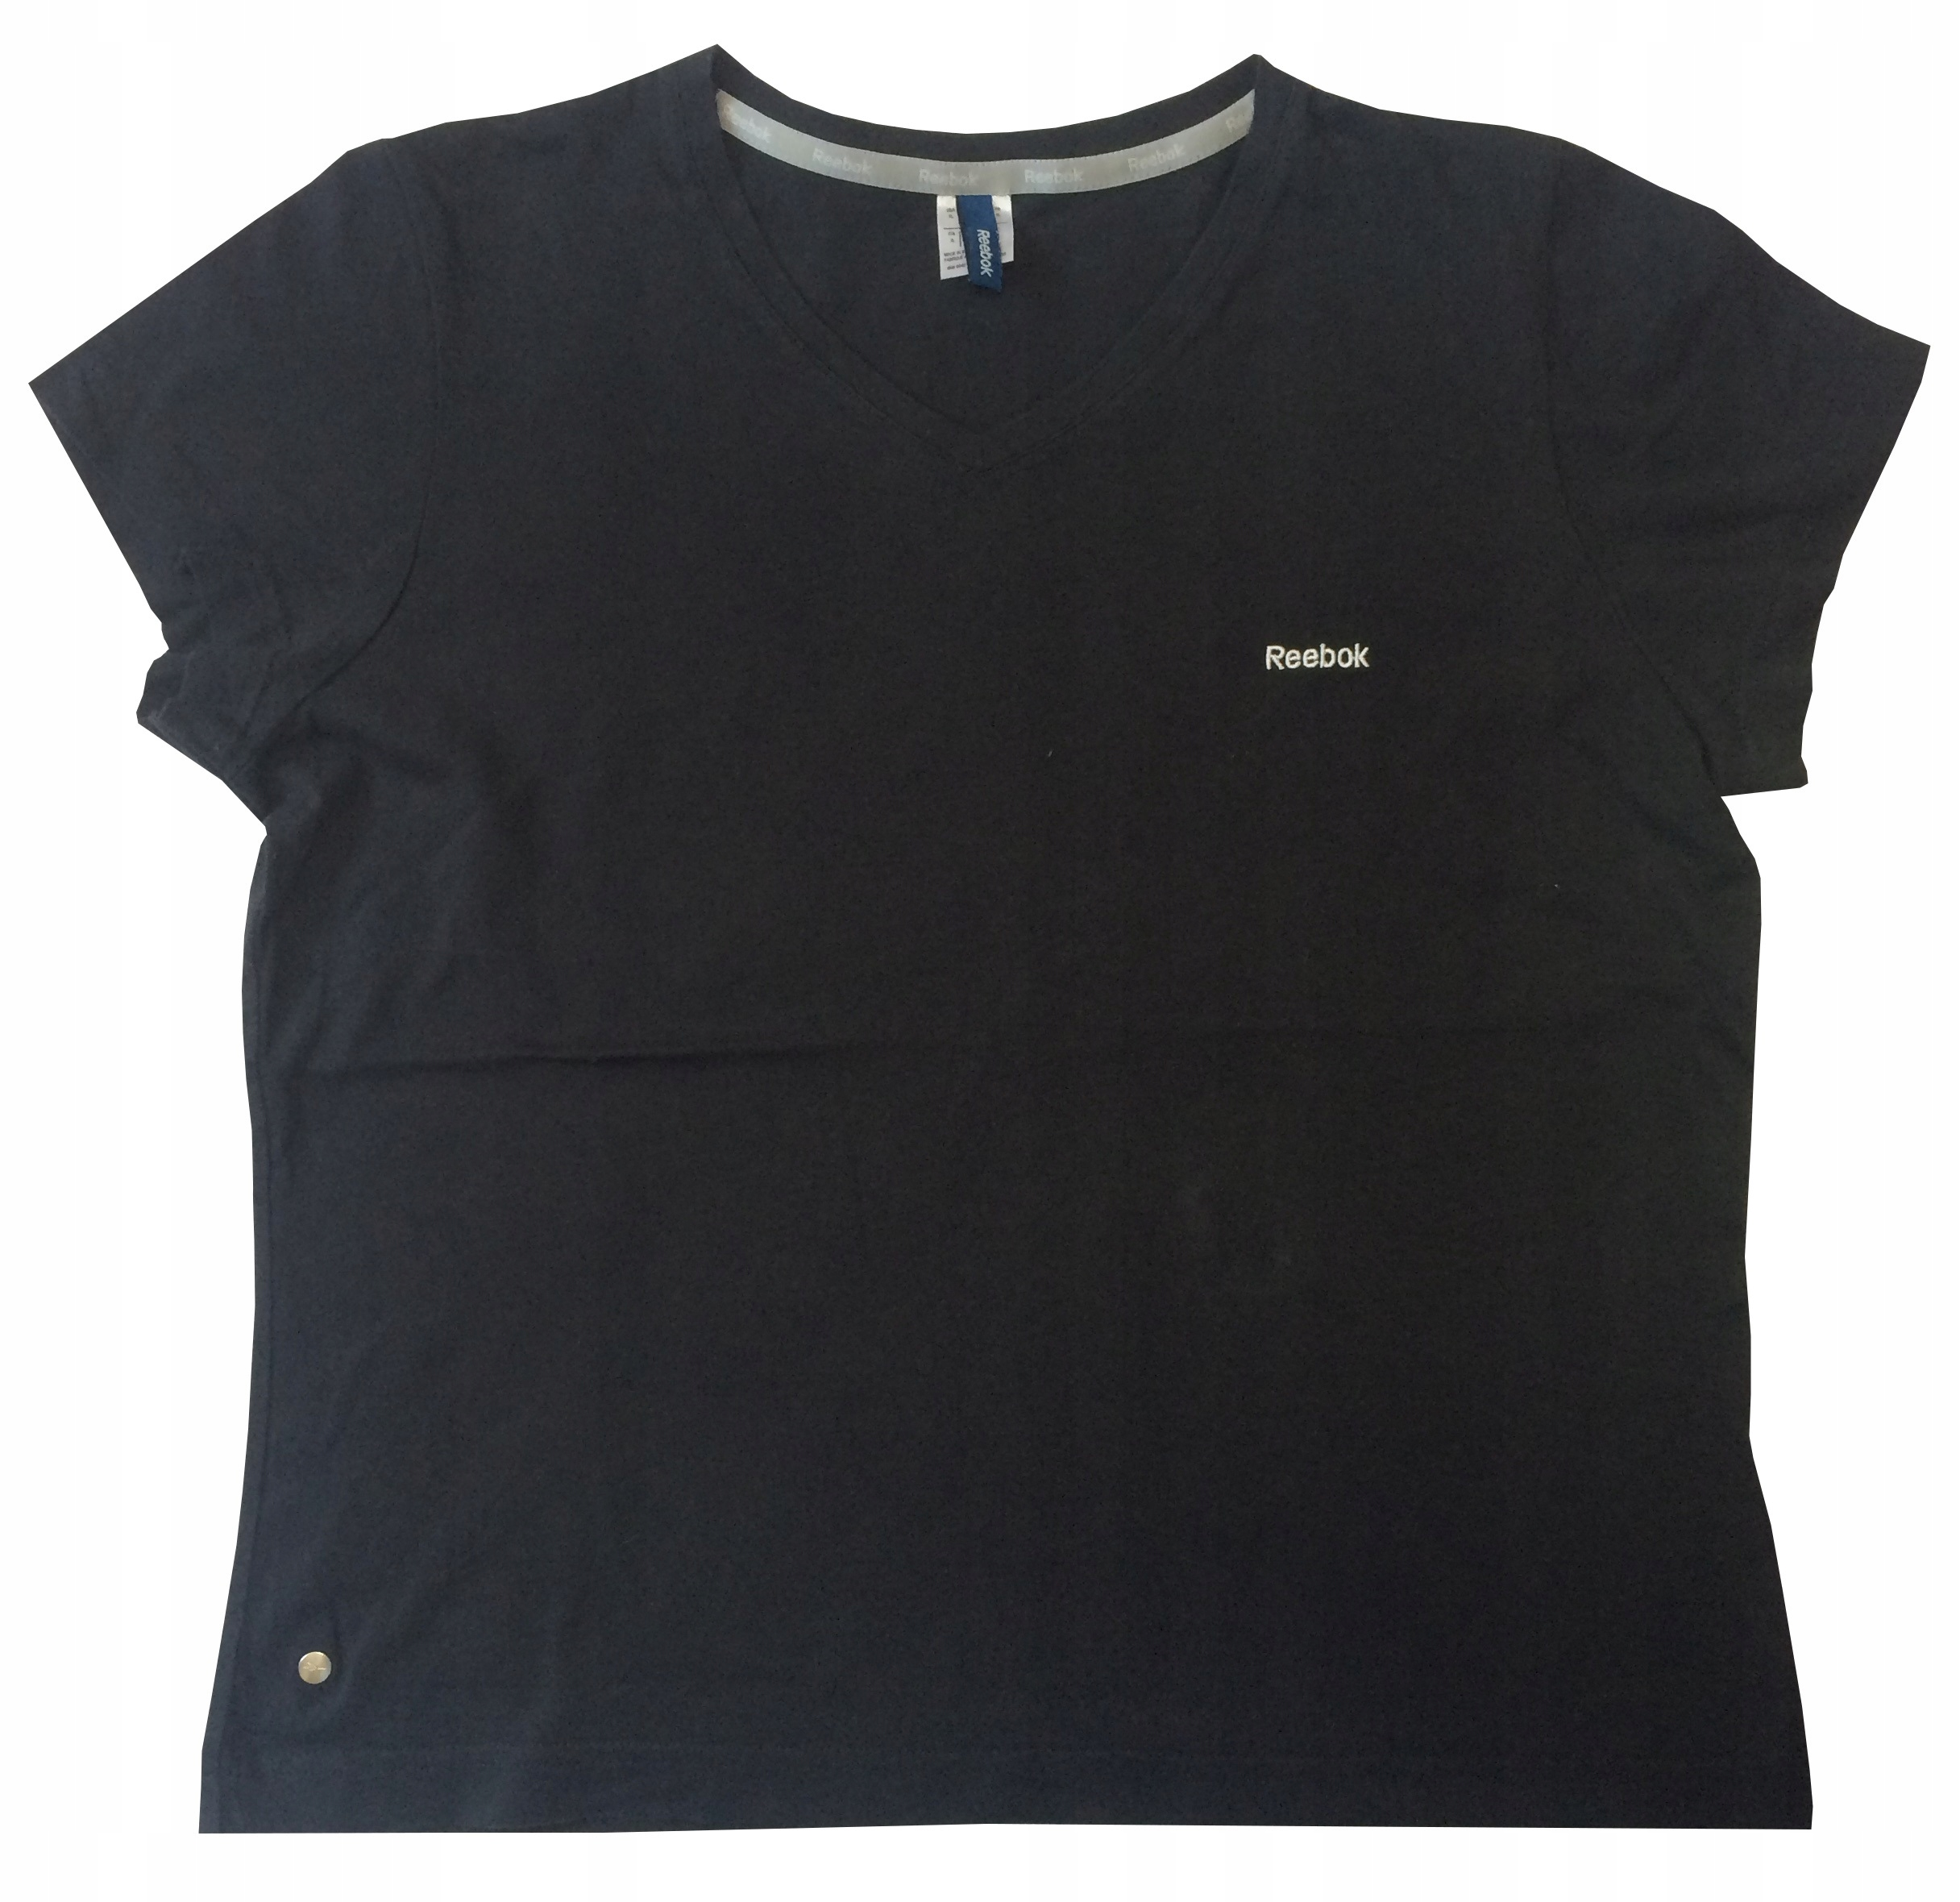 7e2d6c58aa REEBOK czarna koszulka damska t-shirt XL - 6851351372 - oficjalne ...